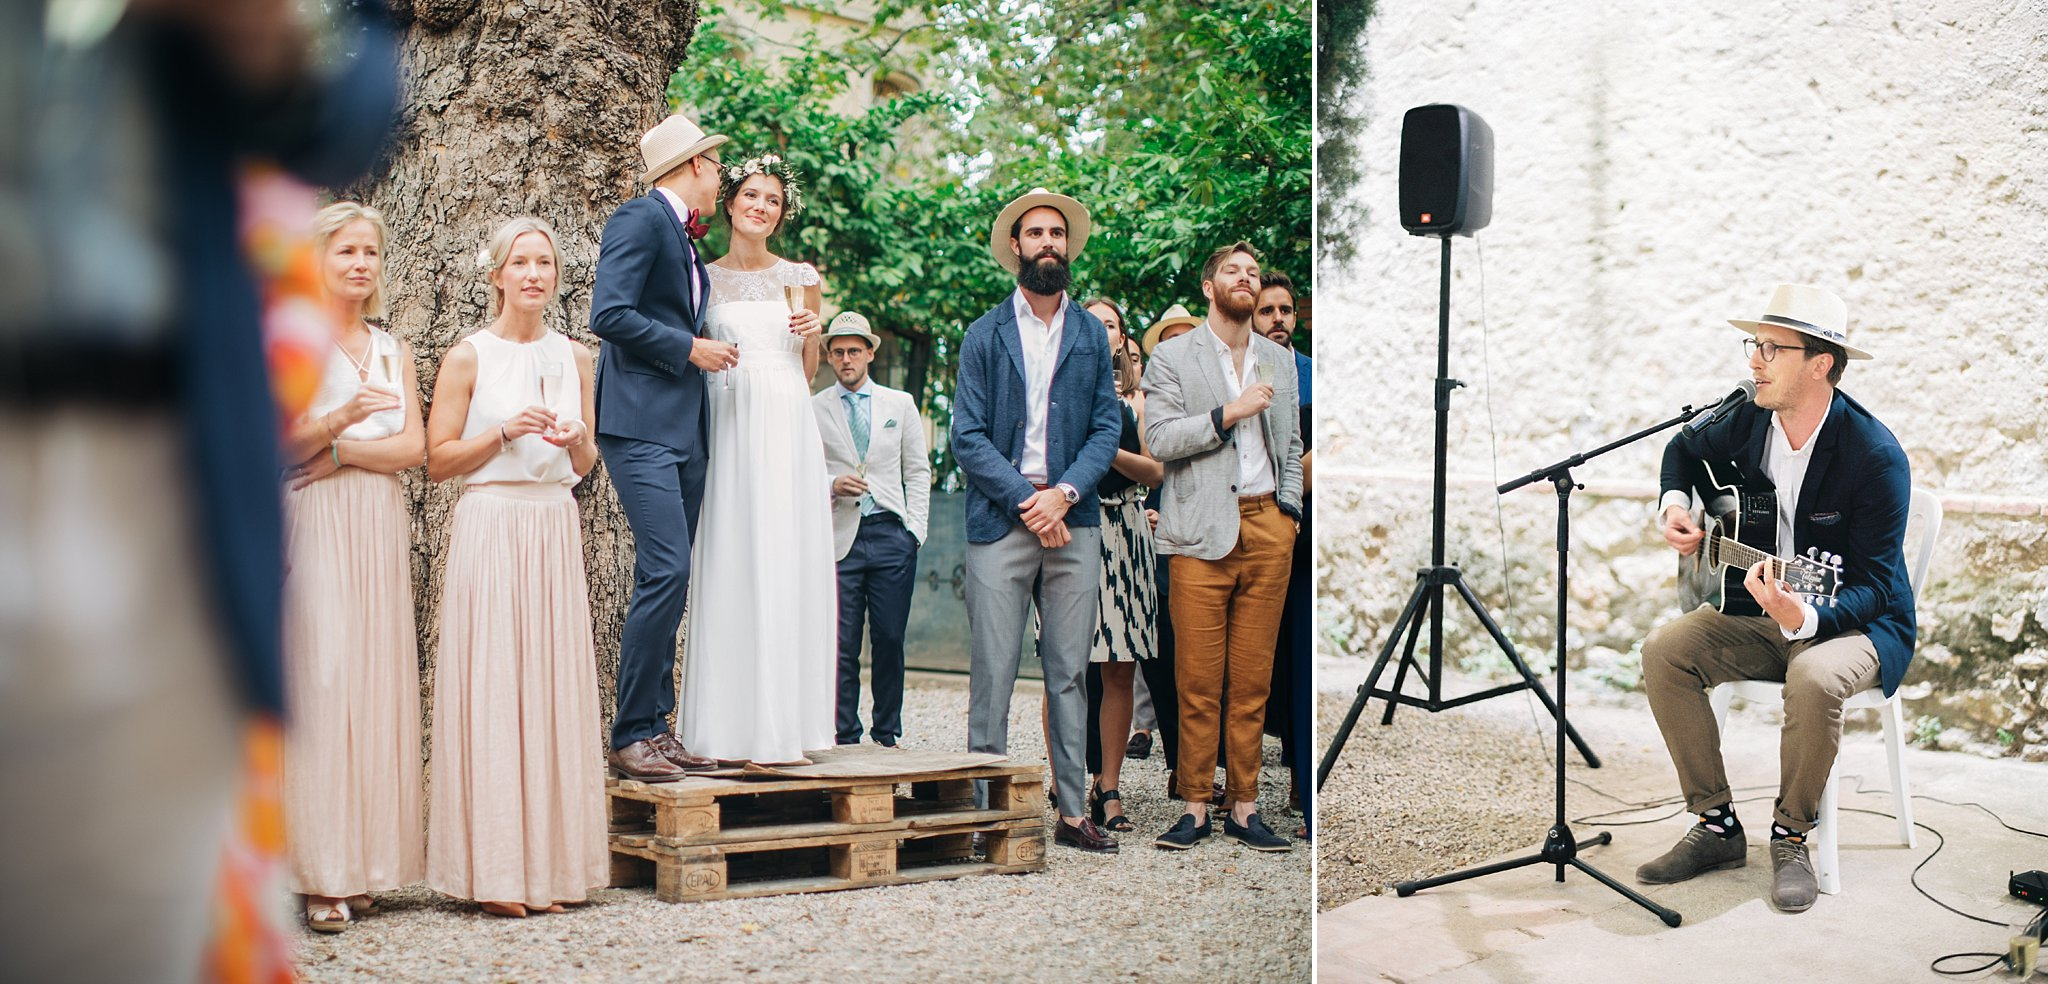 Wedding Photographer Perpignan - Château Las Collas Wedding - Hugo Hennequin038.jpg